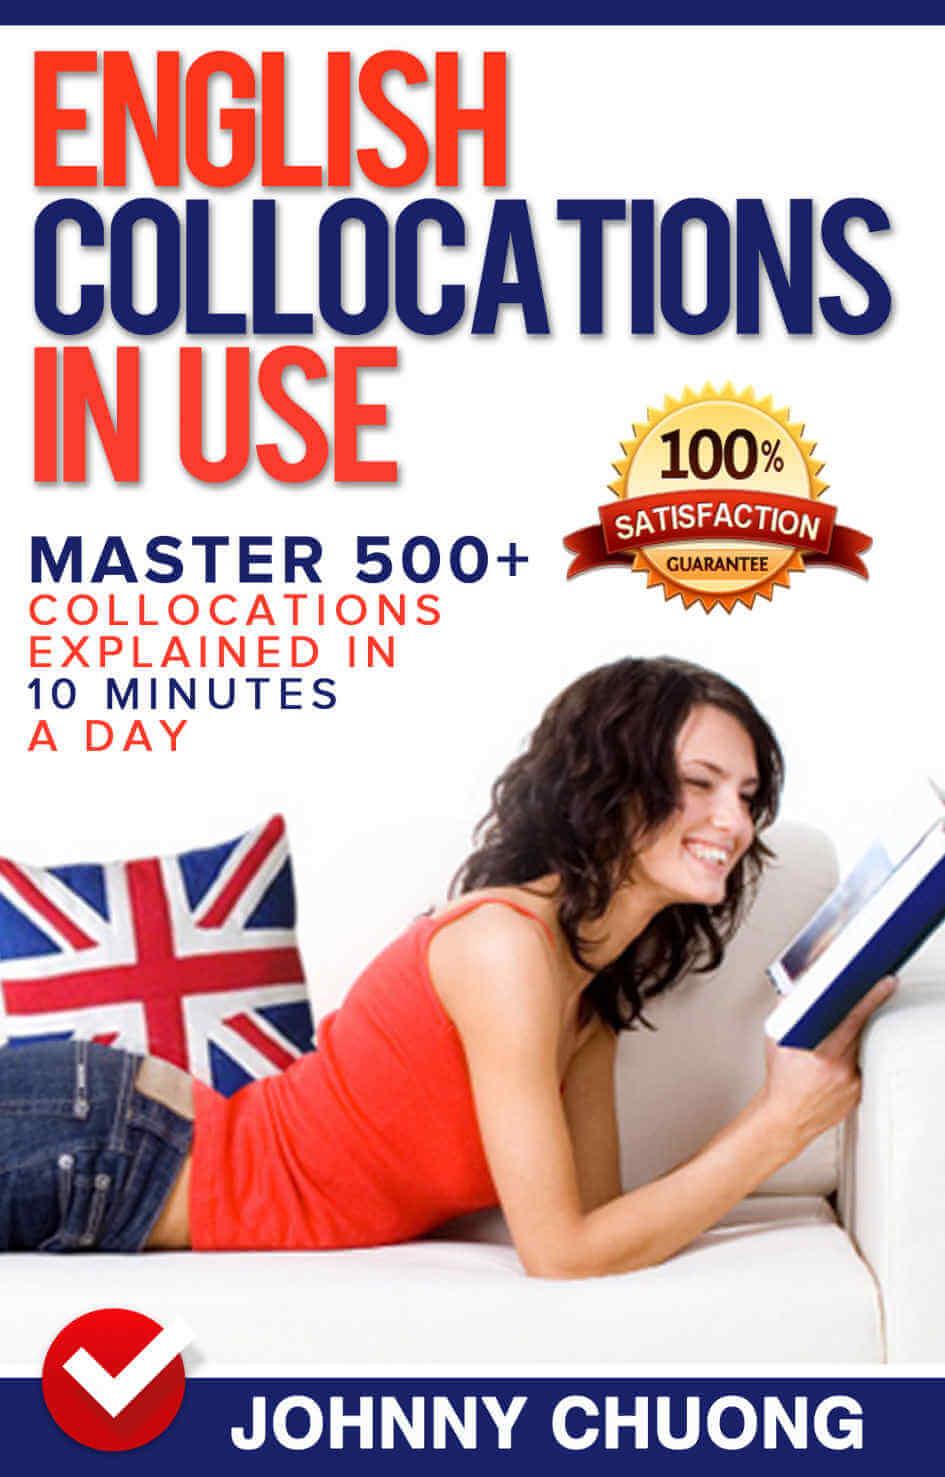 English colocation